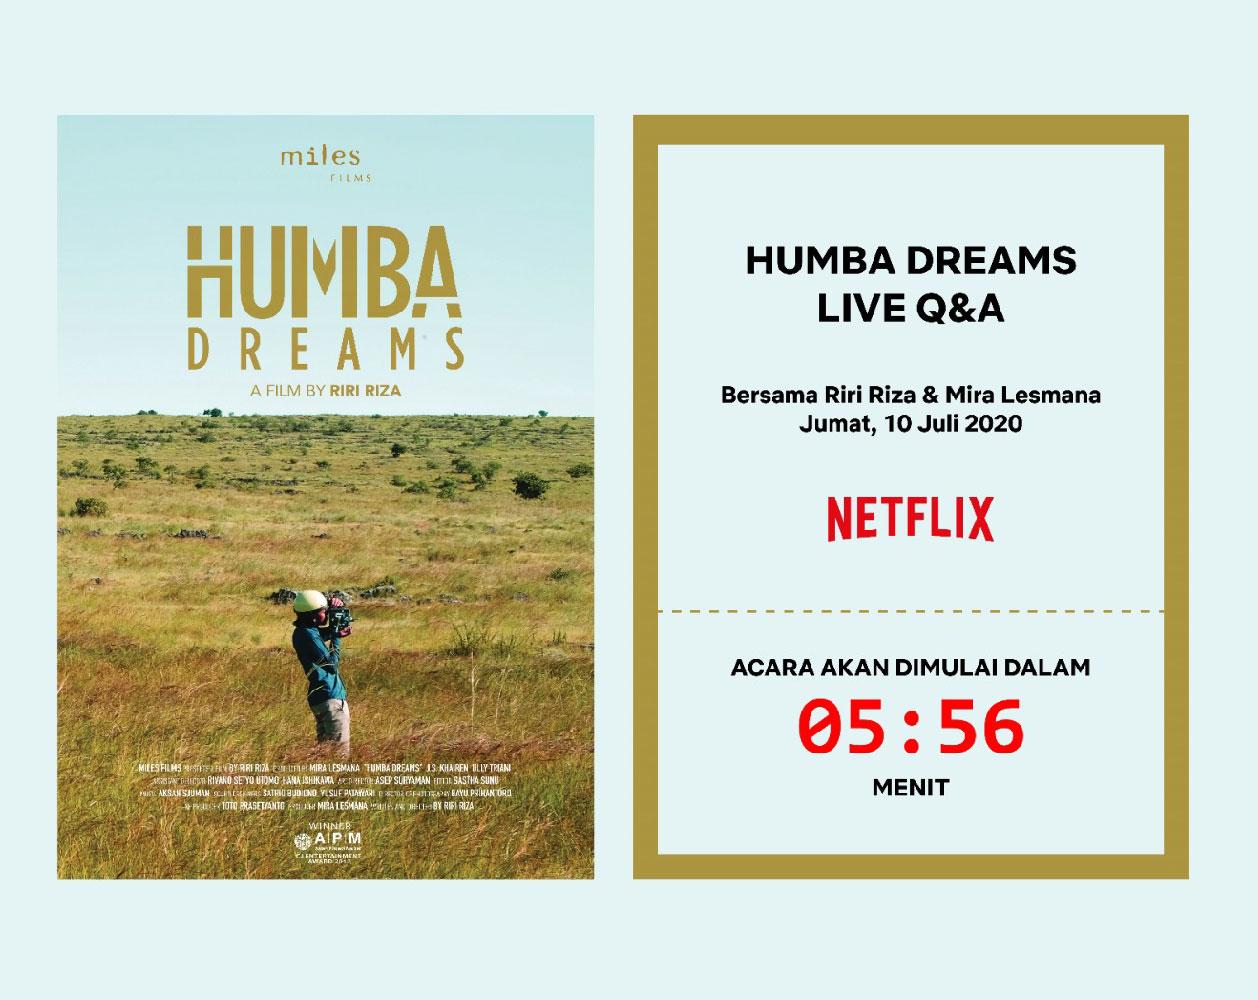 Humba Dreams X Netflix